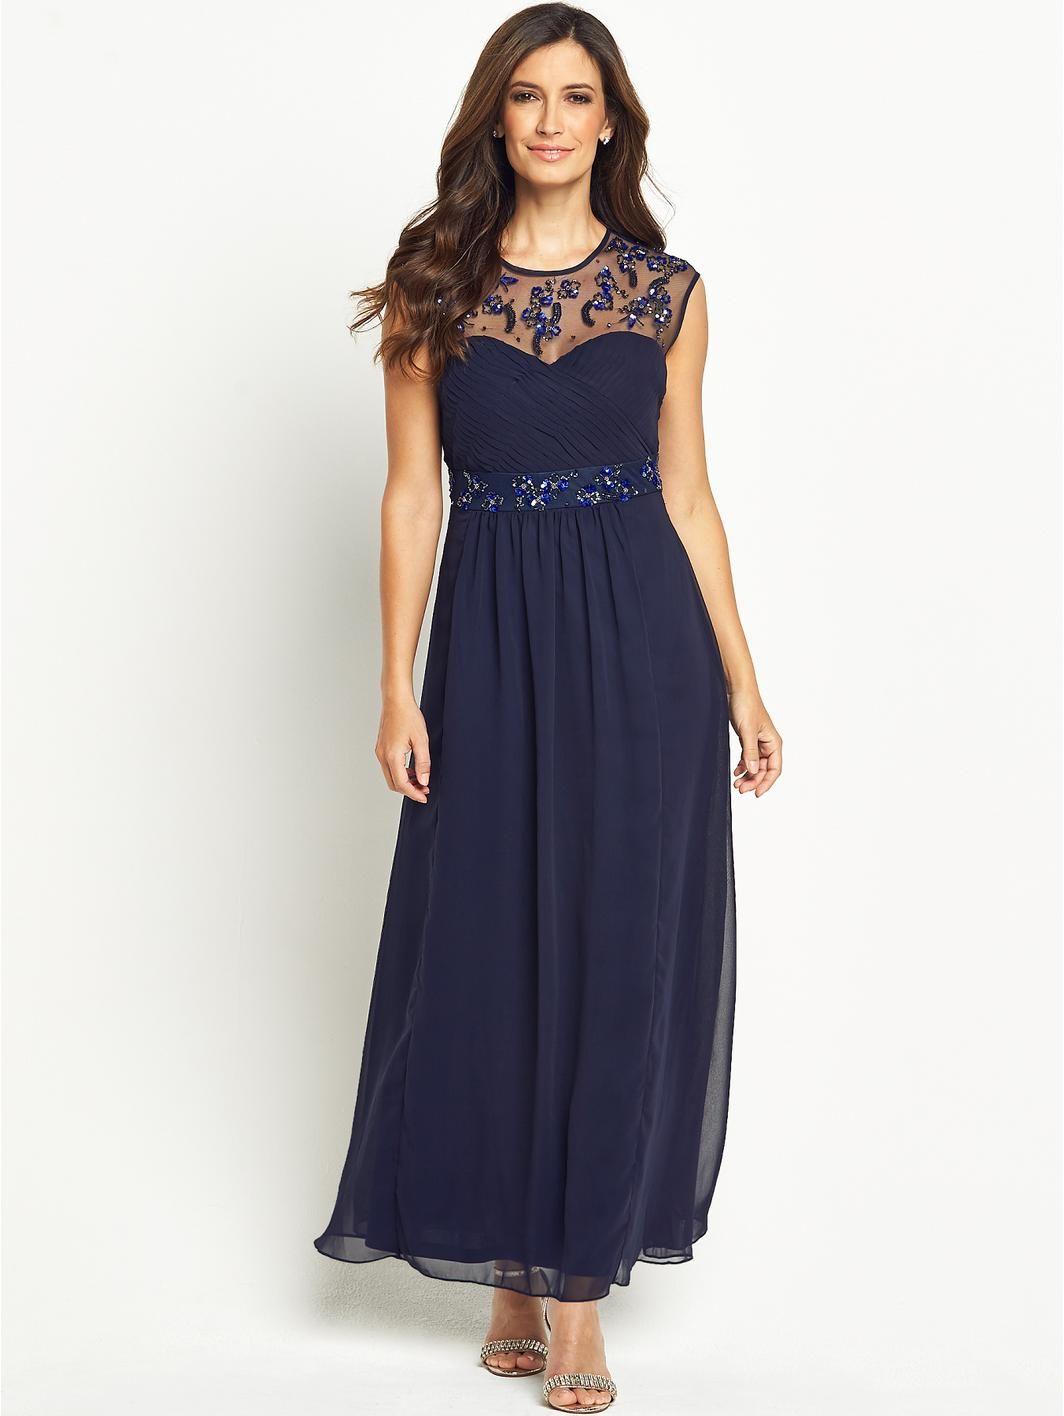 Embellished Top Maxi Dress, http://www.very.co.uk/berkertex ...